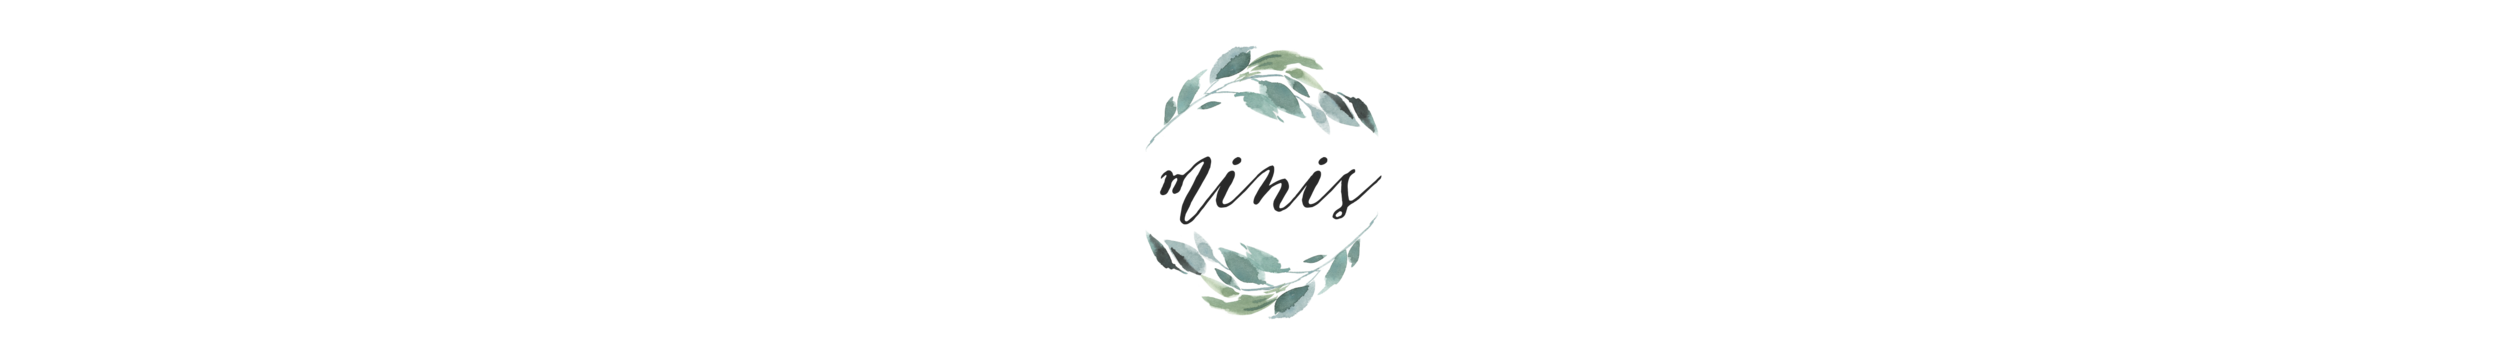 minis.png